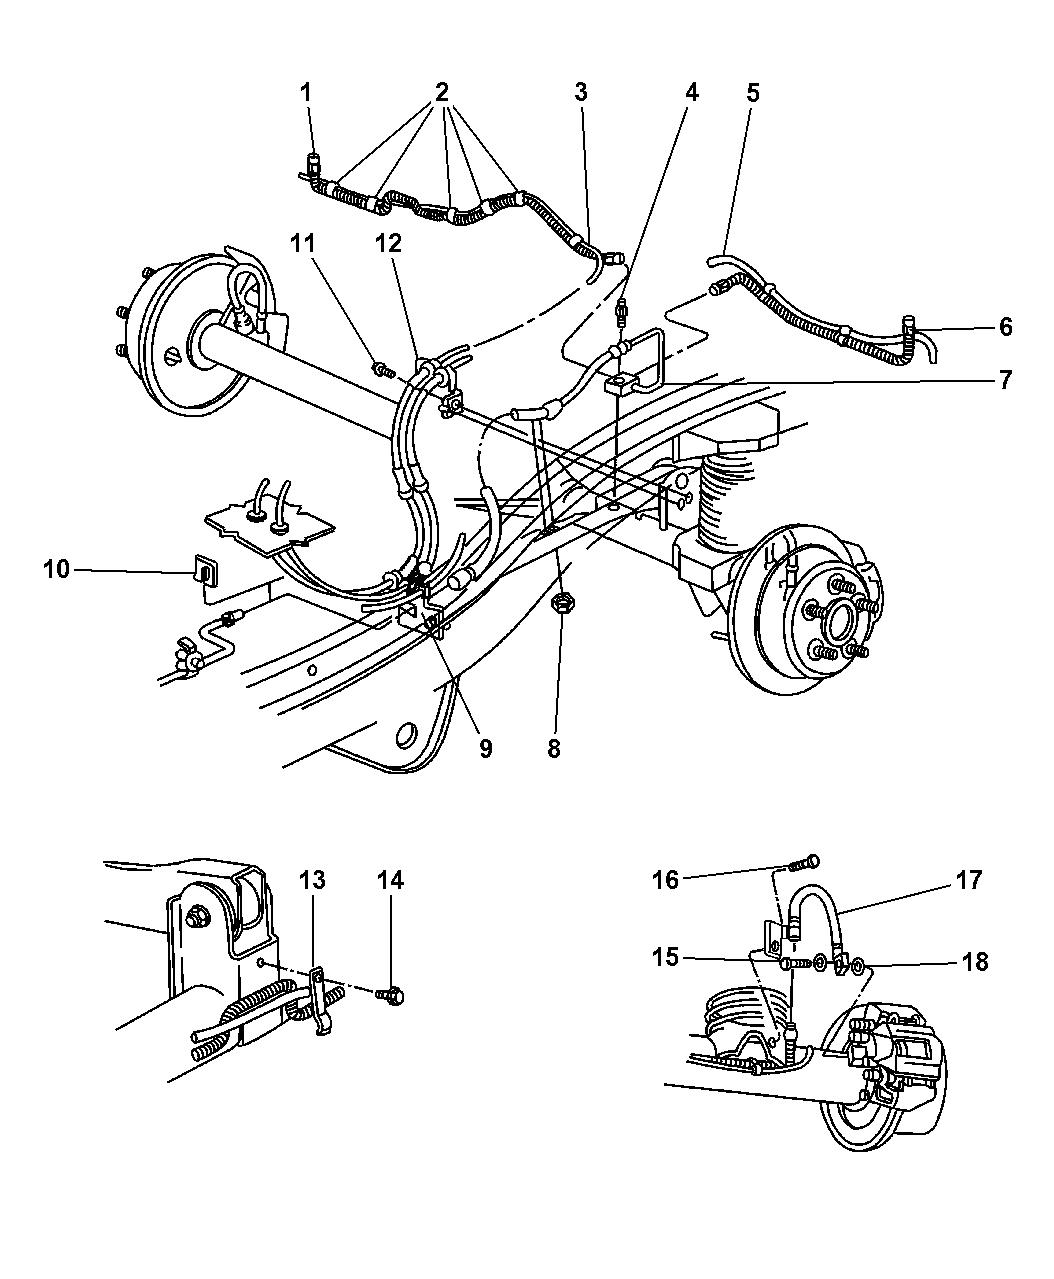 1998 Jeep Grand Cherokee Brake Lines & Hoses, Rear